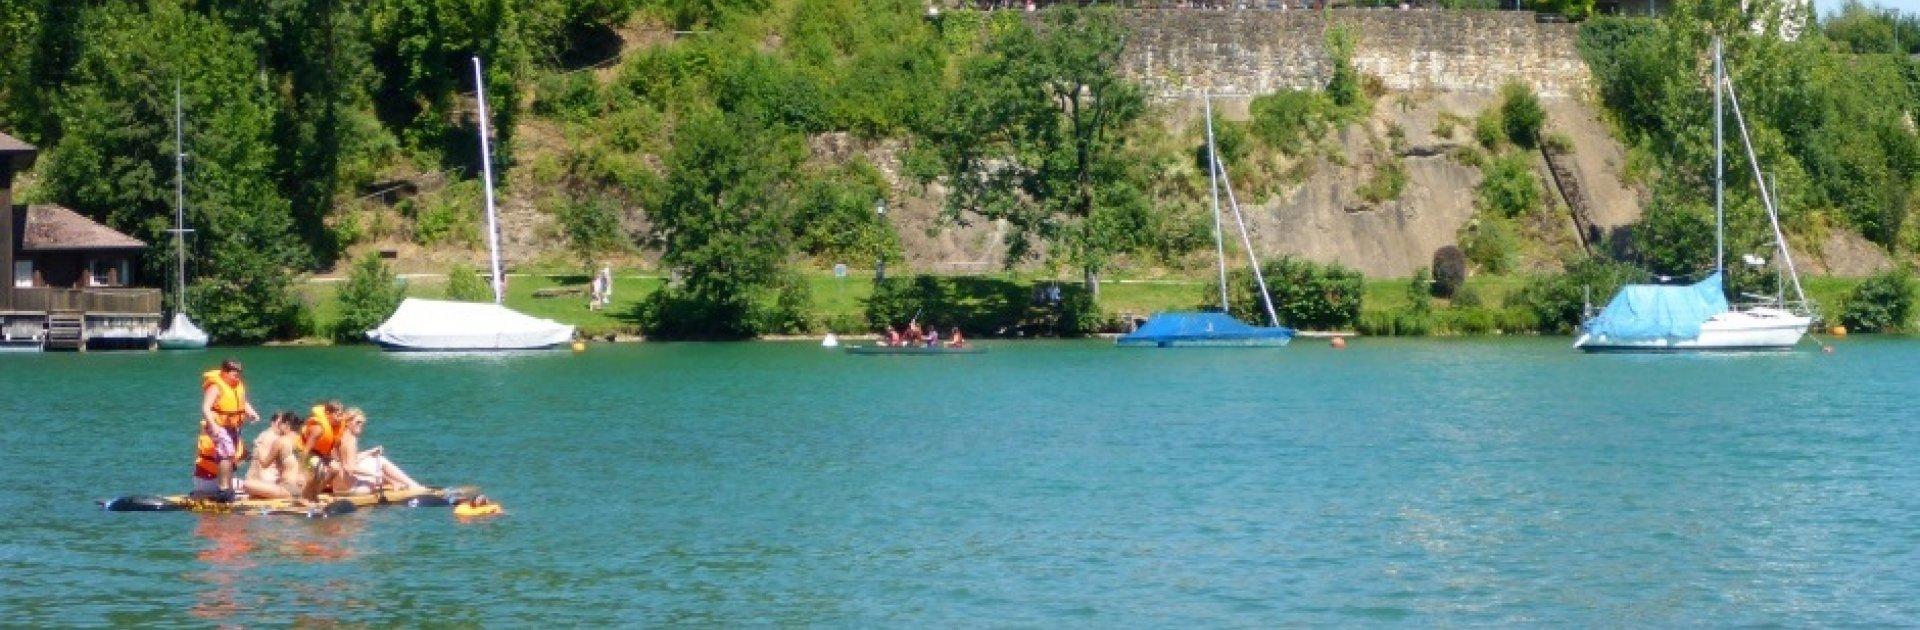 Familienaktivwoche Salzburger Seenland